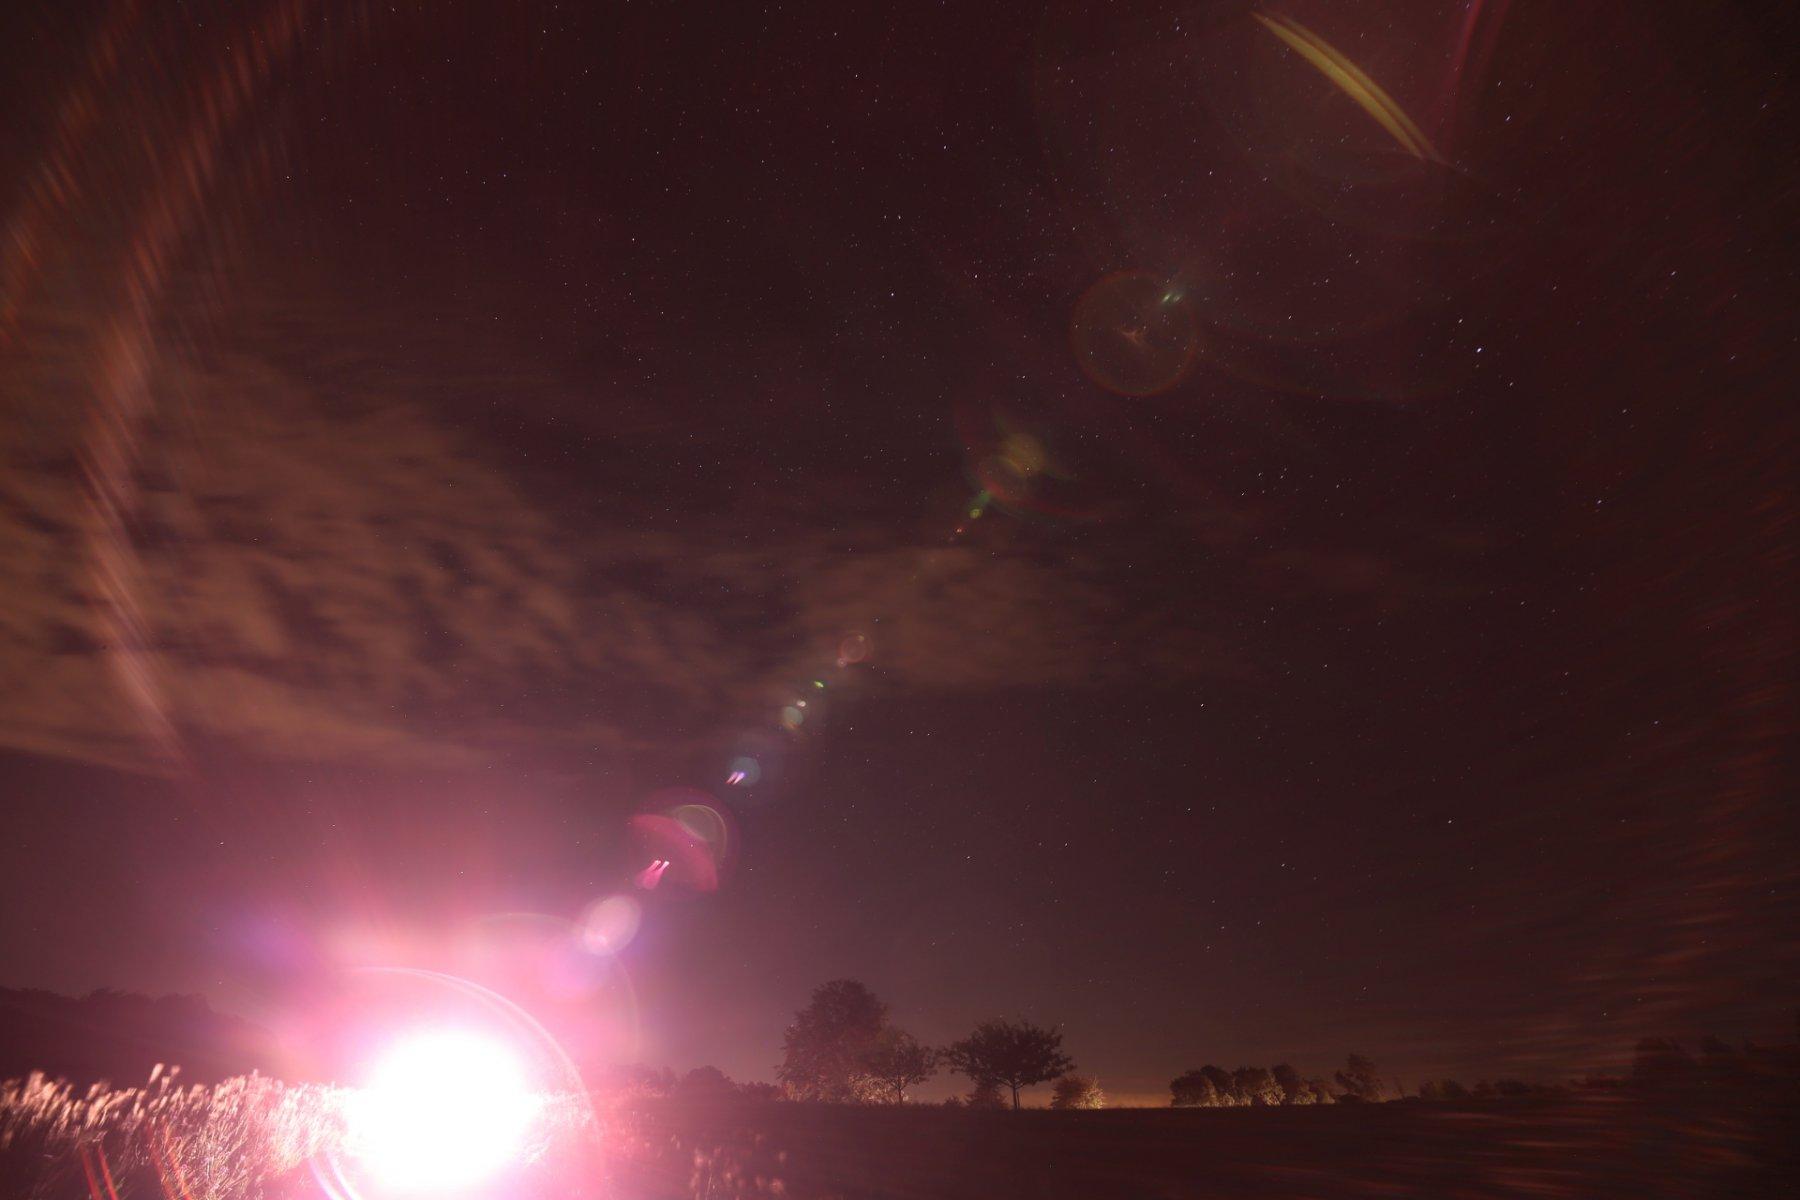 IMG_6677_depp_flares_f.jpg